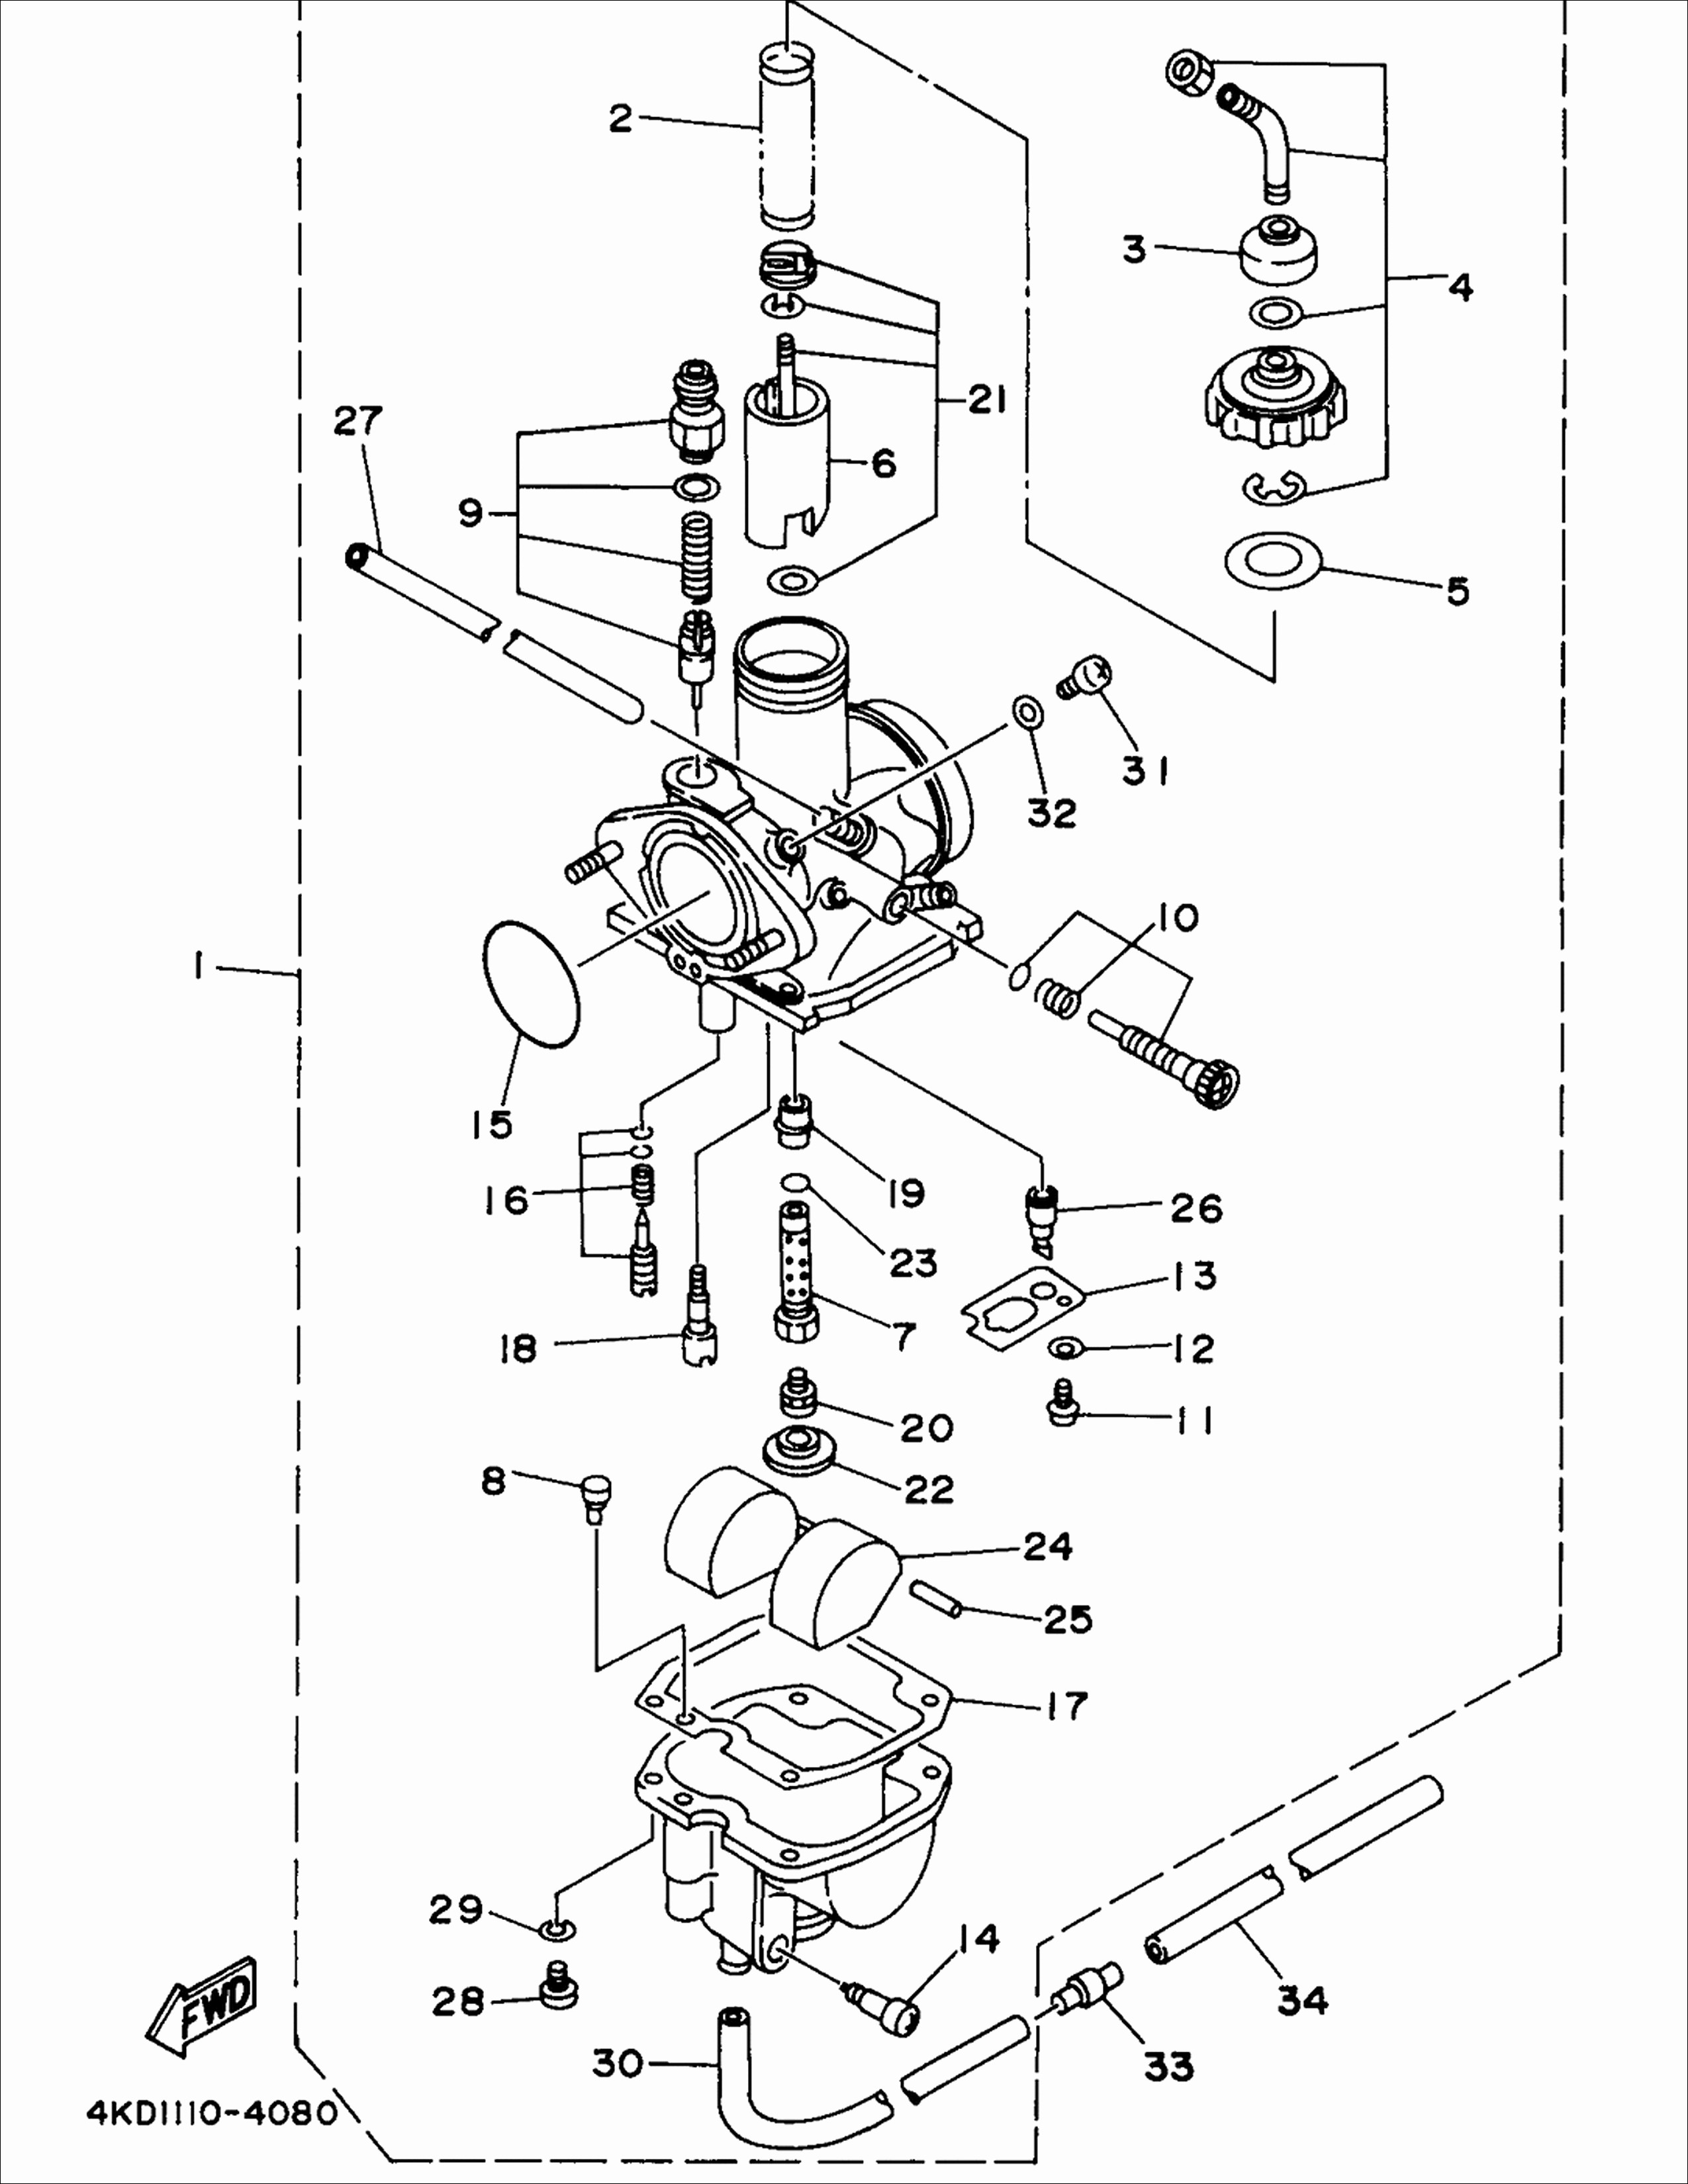 Pontiac Grand Prix Instrument Panel Wiring Diagram Wiring Diagram